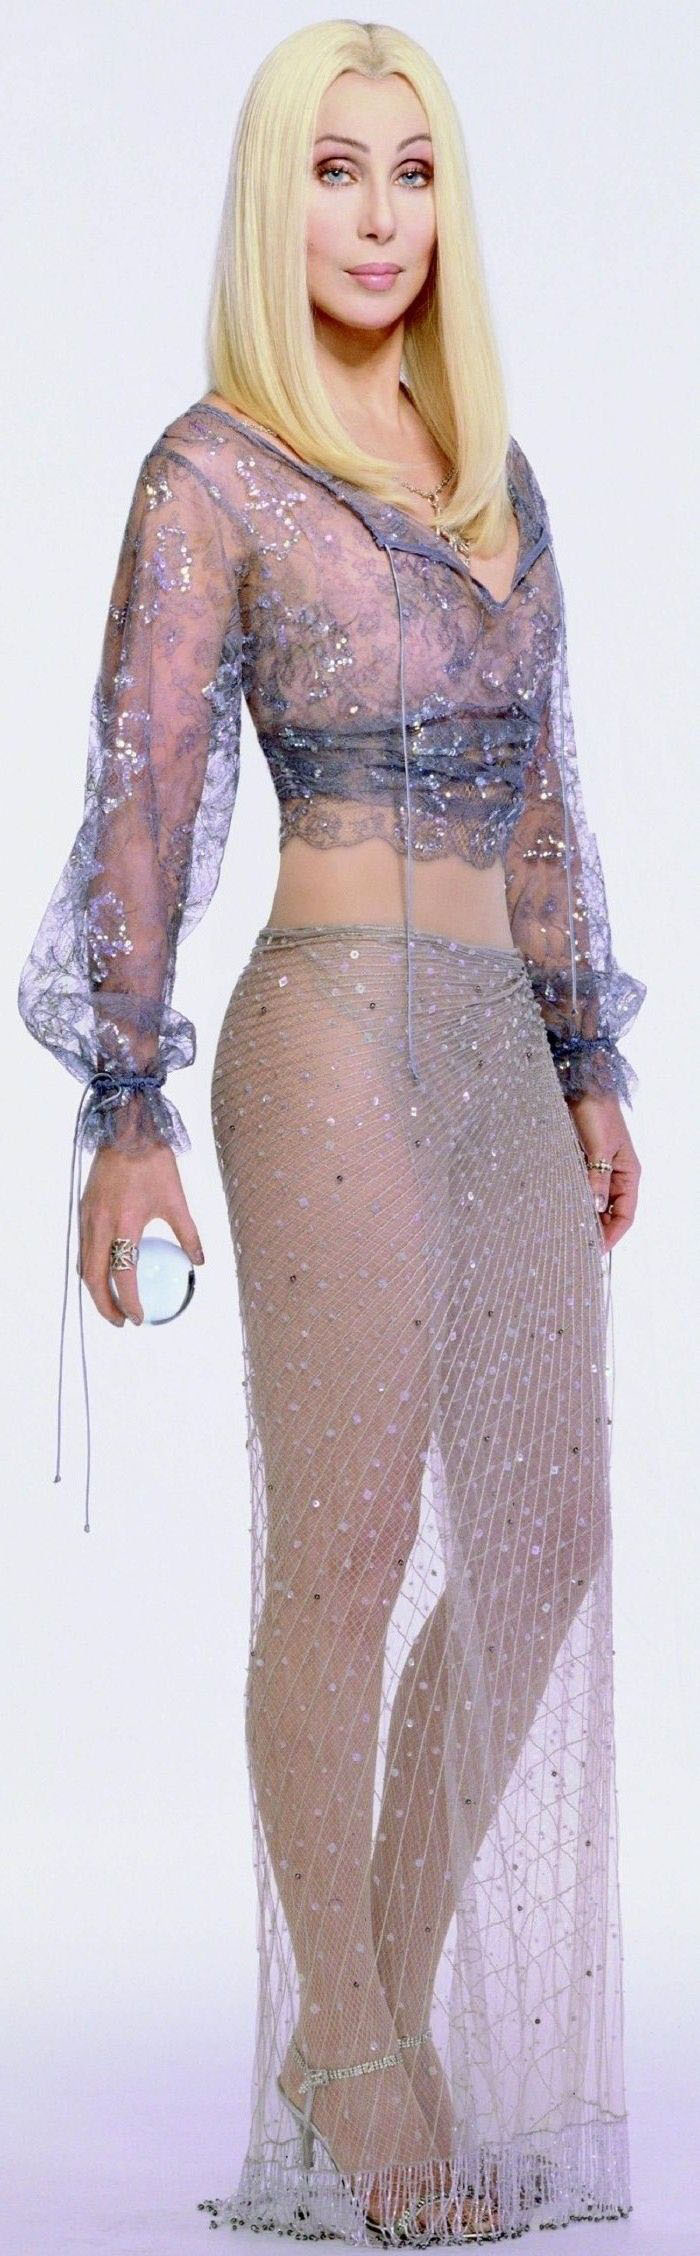 Cher Nackt. Fotografie - 17